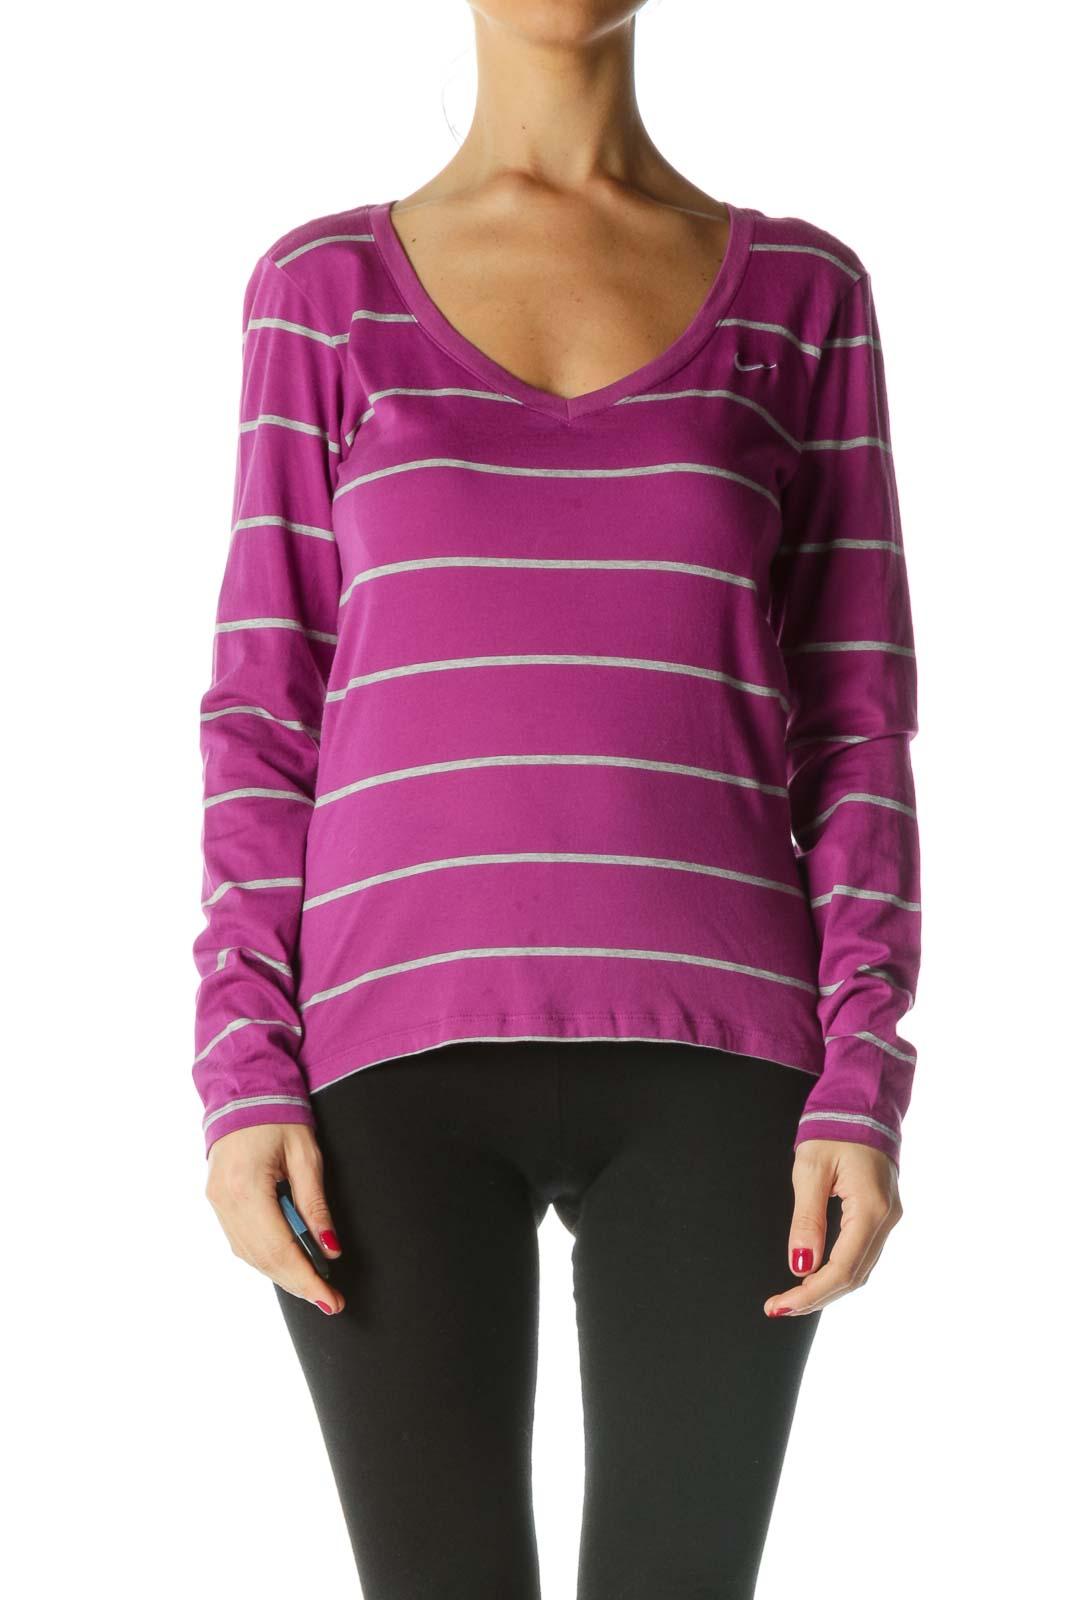 Purple Gray Striped V-Neck Active Top